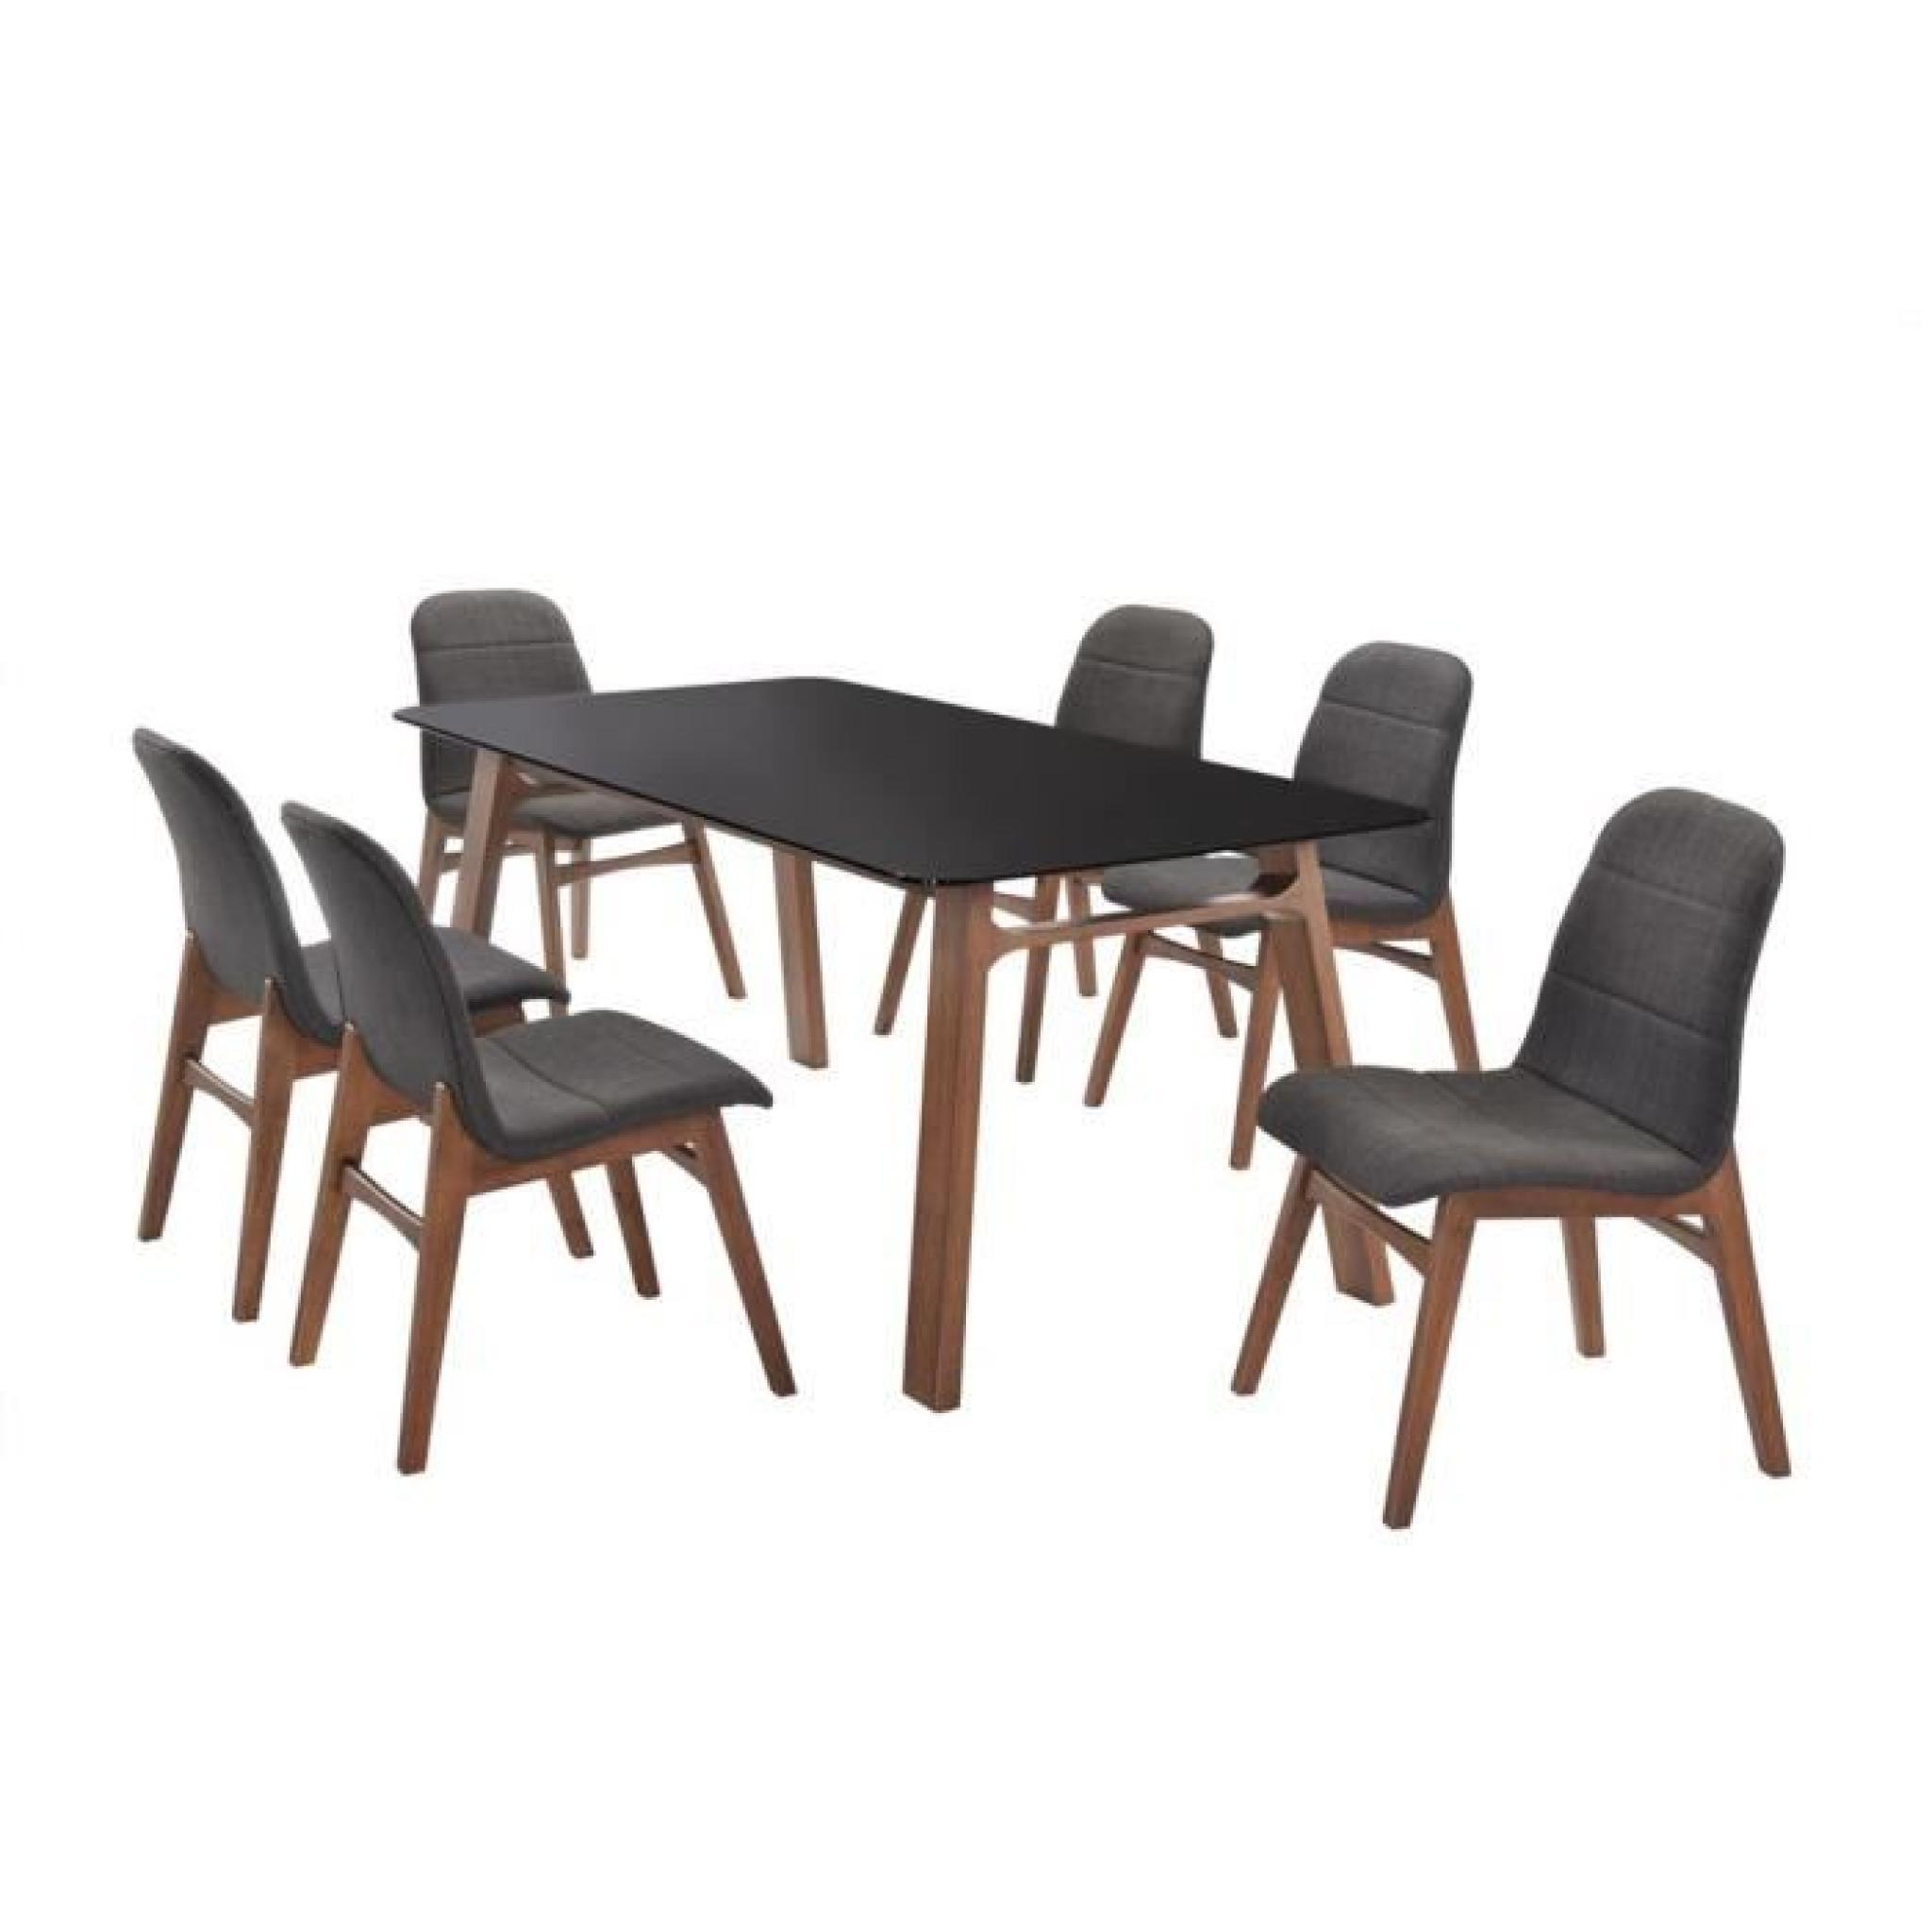 Table jenja swithome zen noir achat vente table salle a for Table salle a manger zen